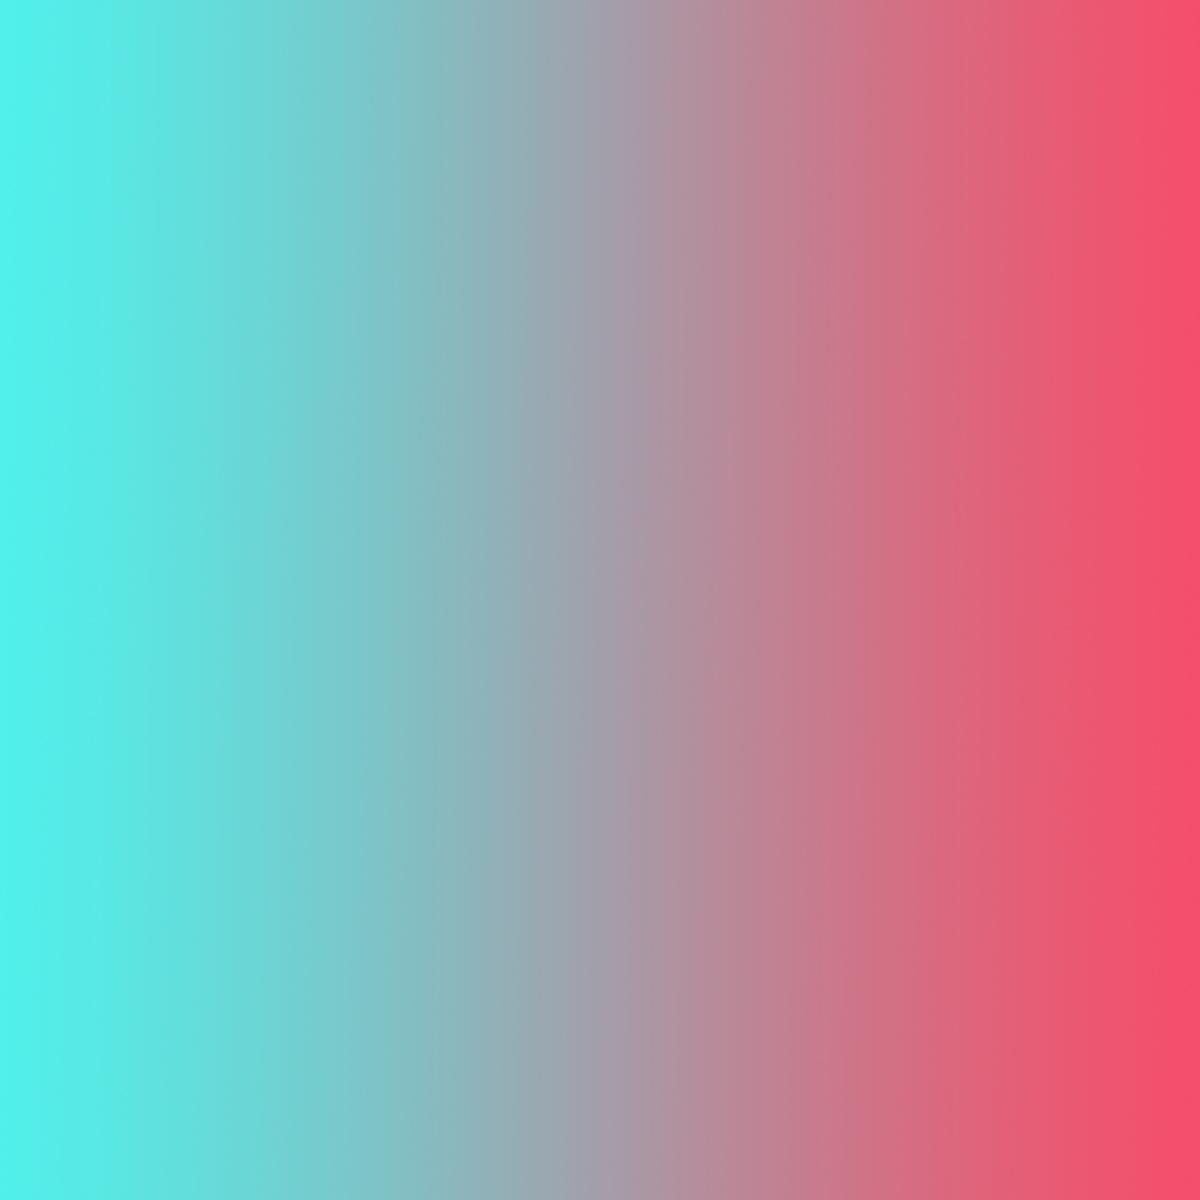 blue-red.jpg